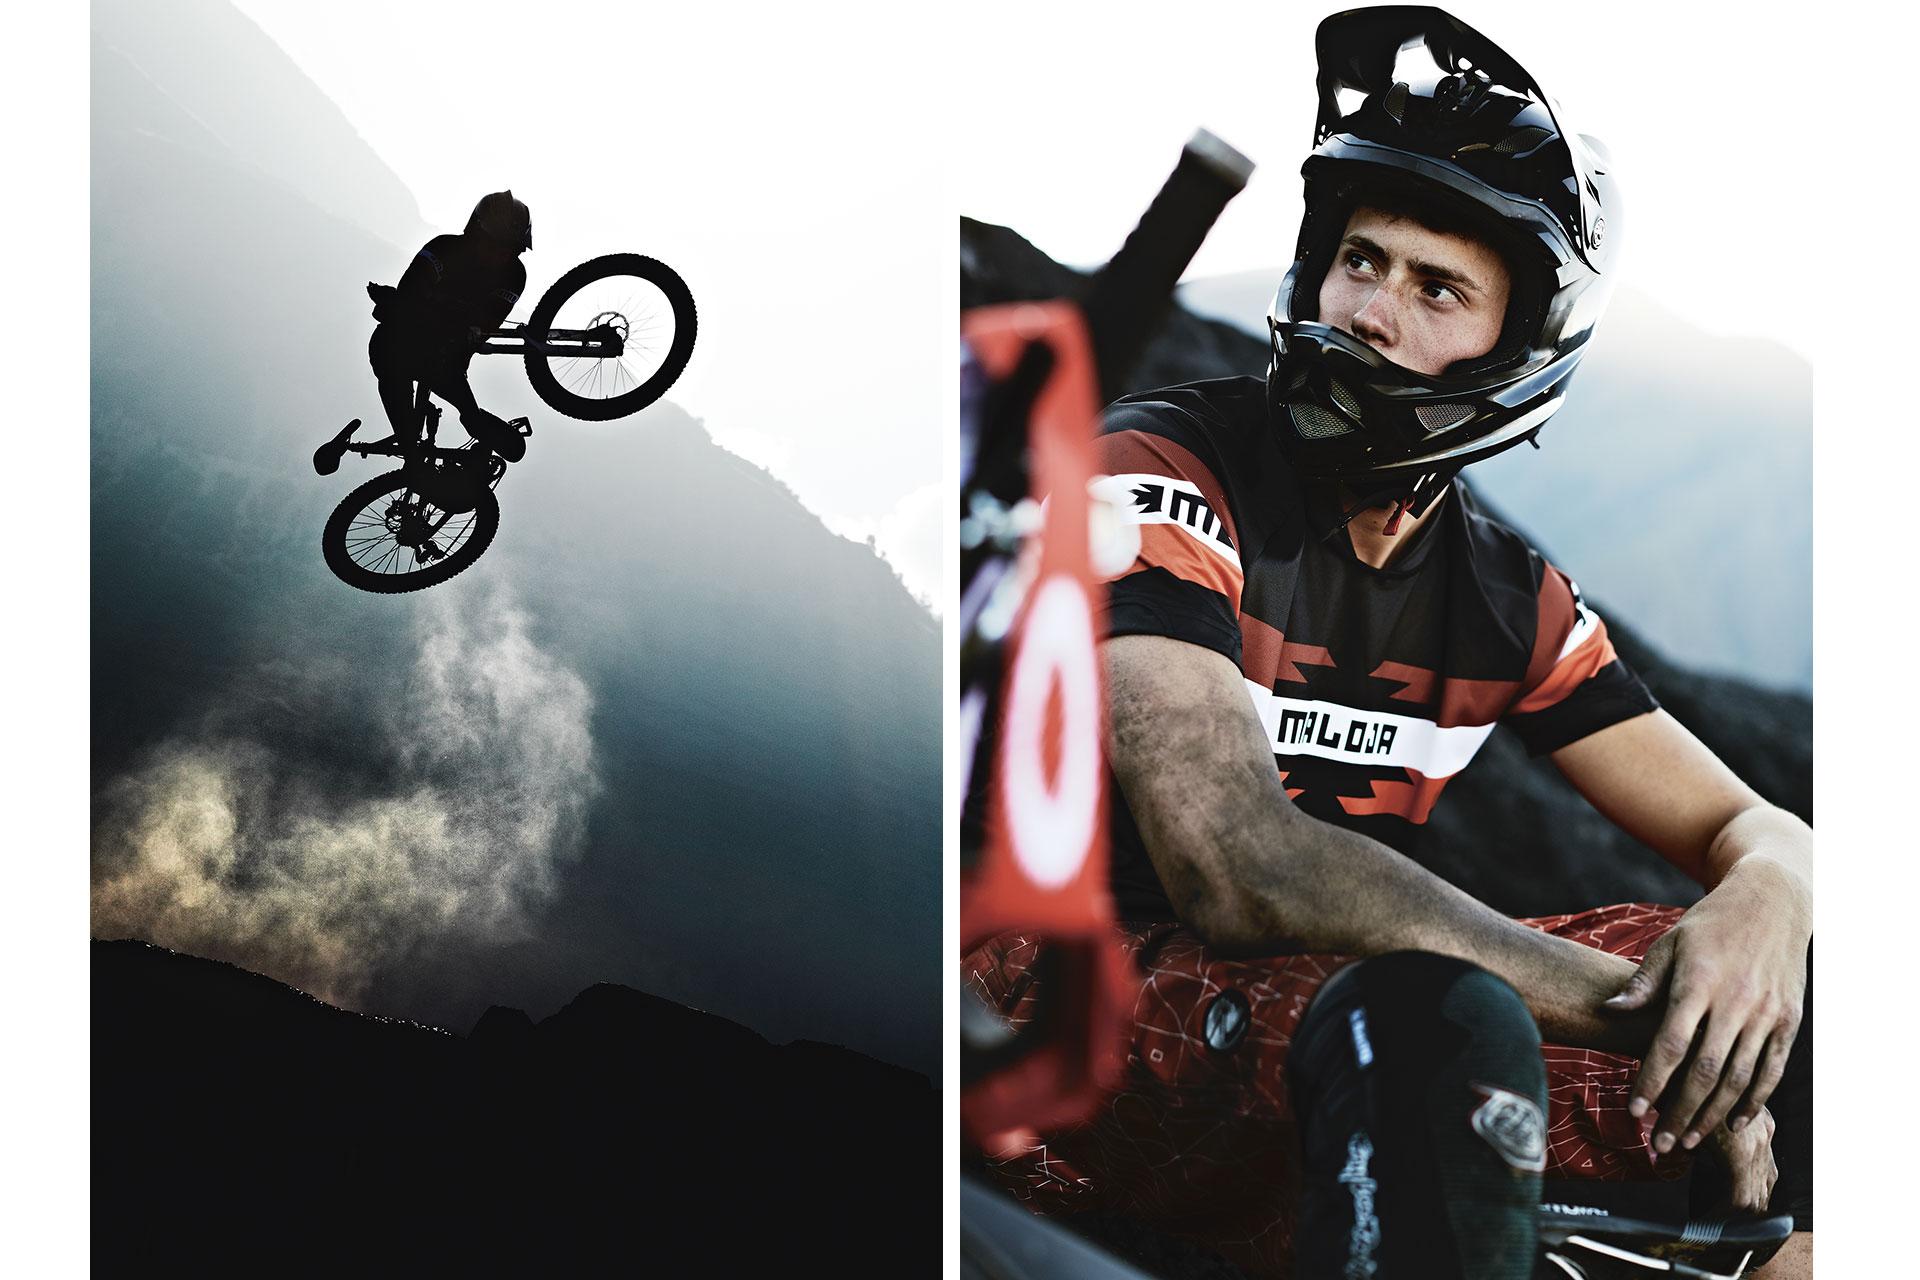 Freeride Mountainbike Sport Aktion Fotograf Sprung Peru Downhill Michael Müller